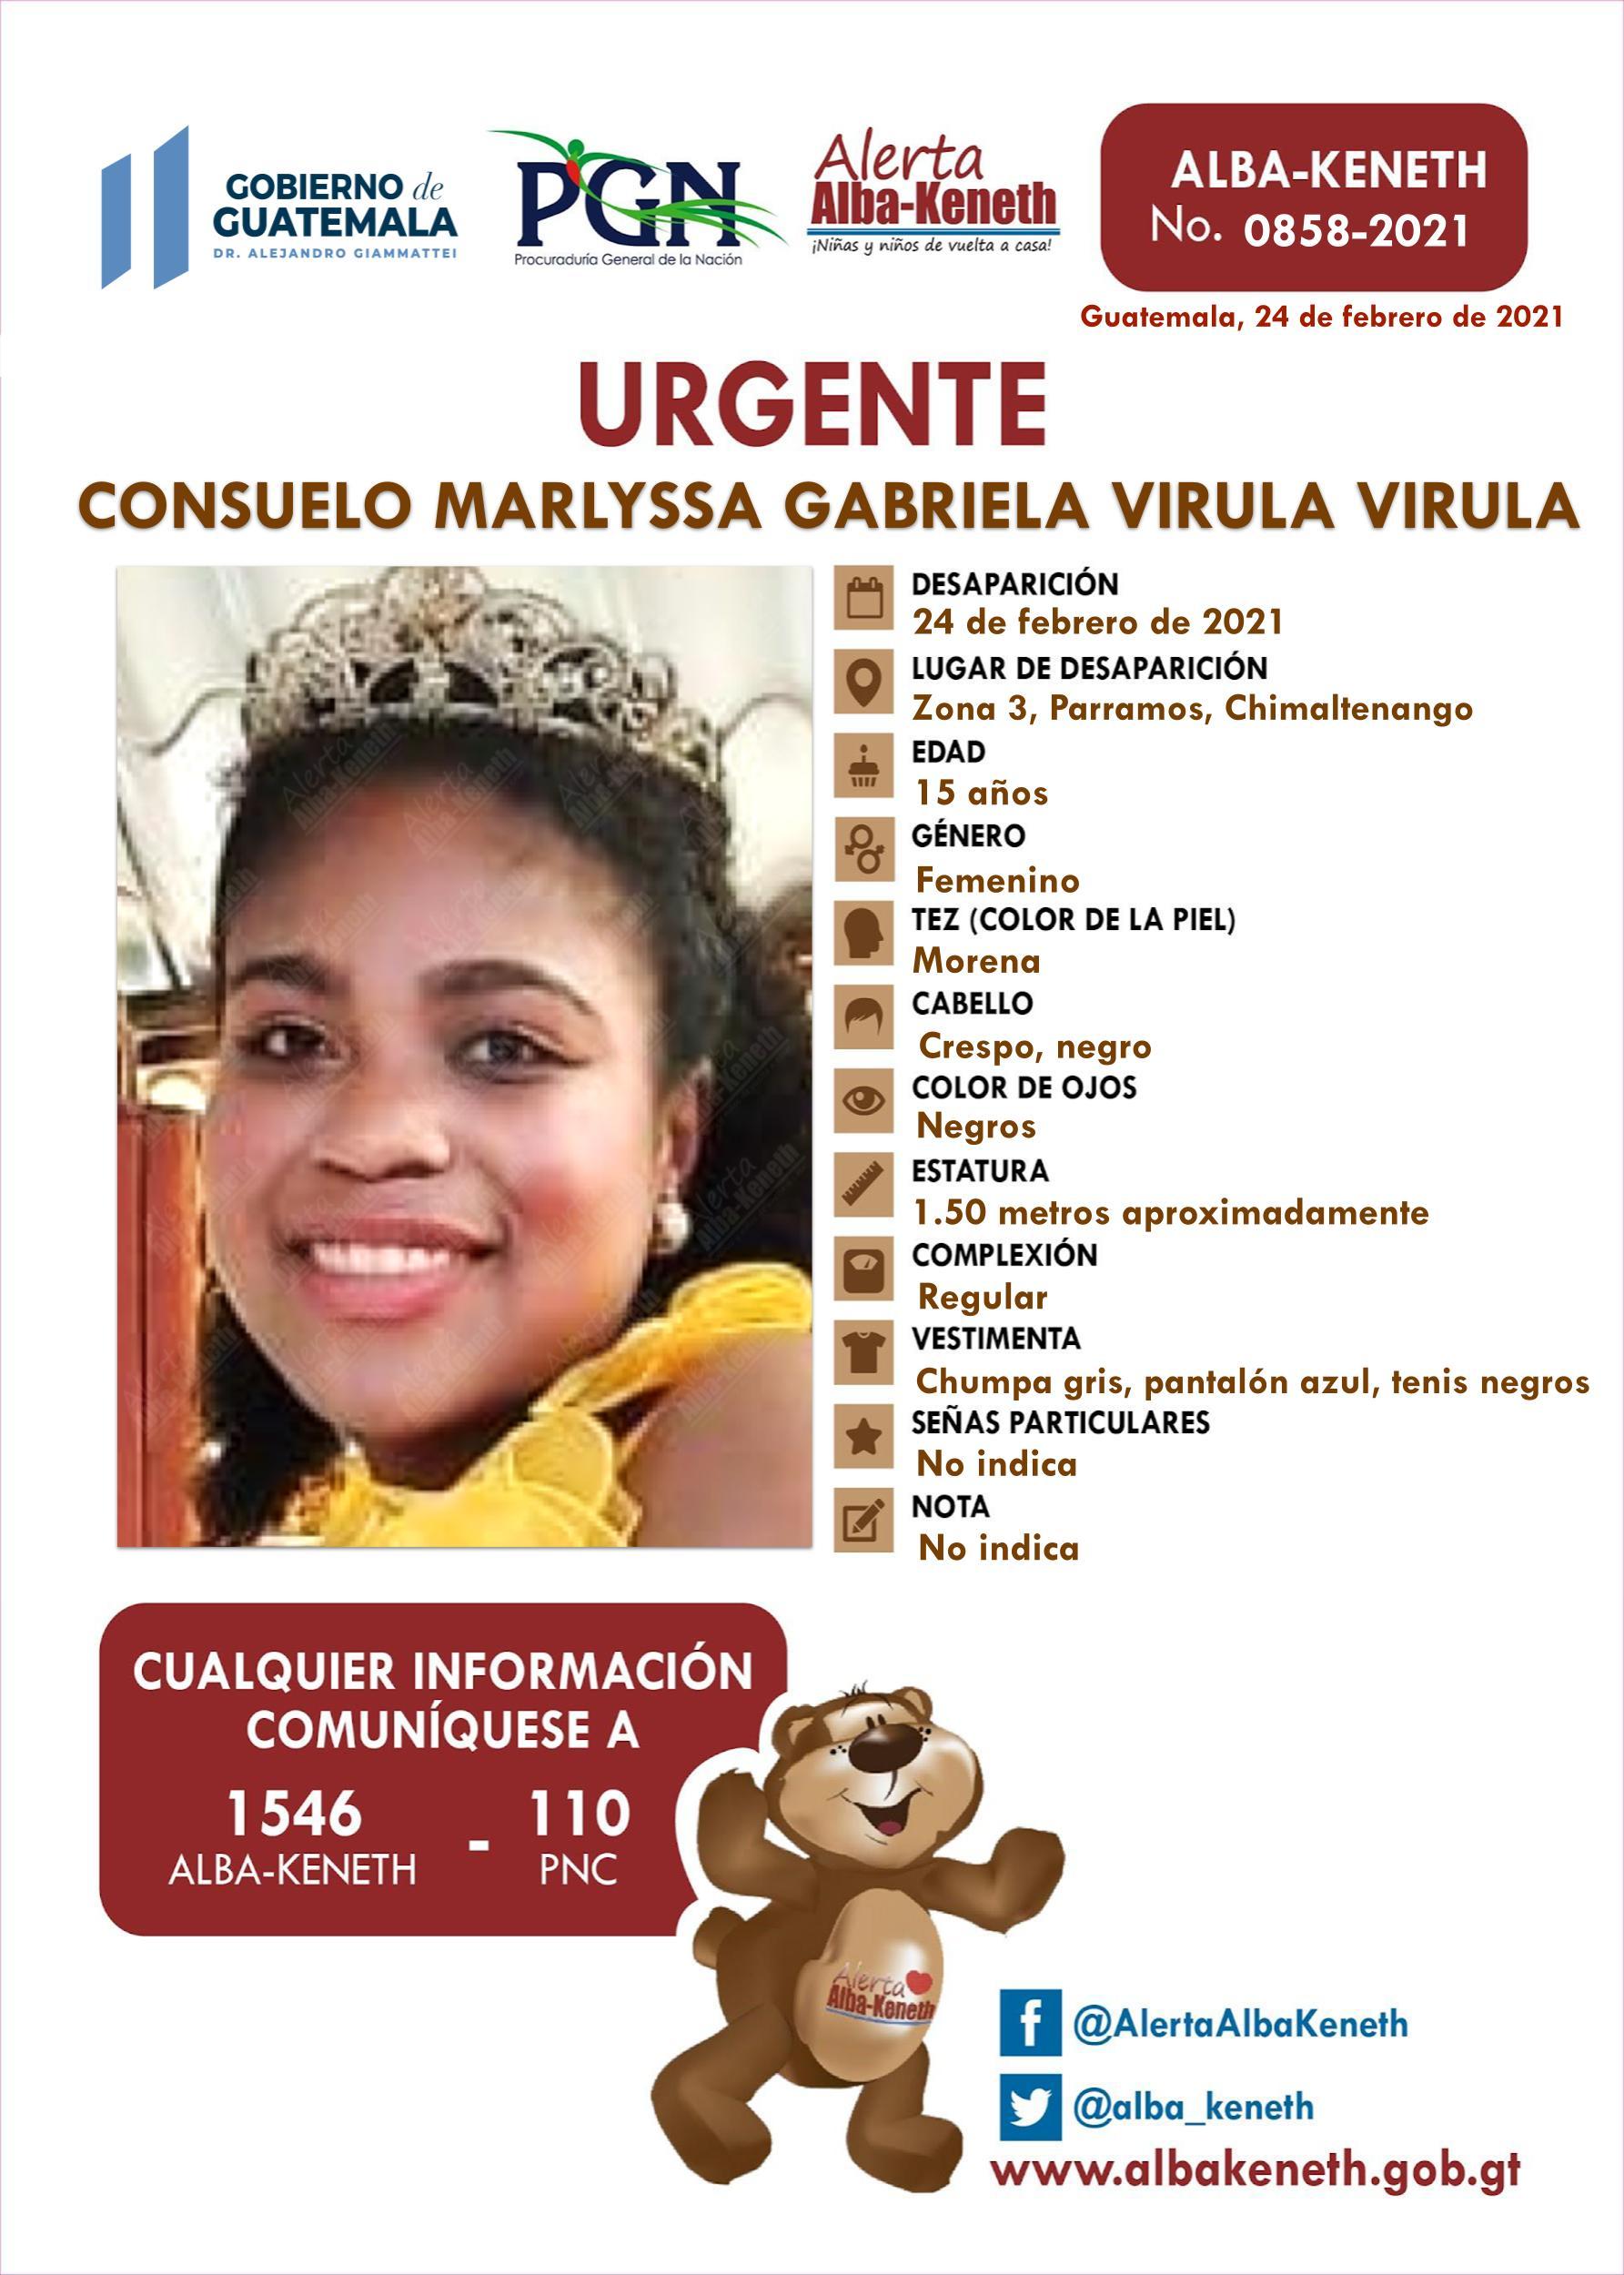 Consuelo Marlyssa Gabriela Virula Virula